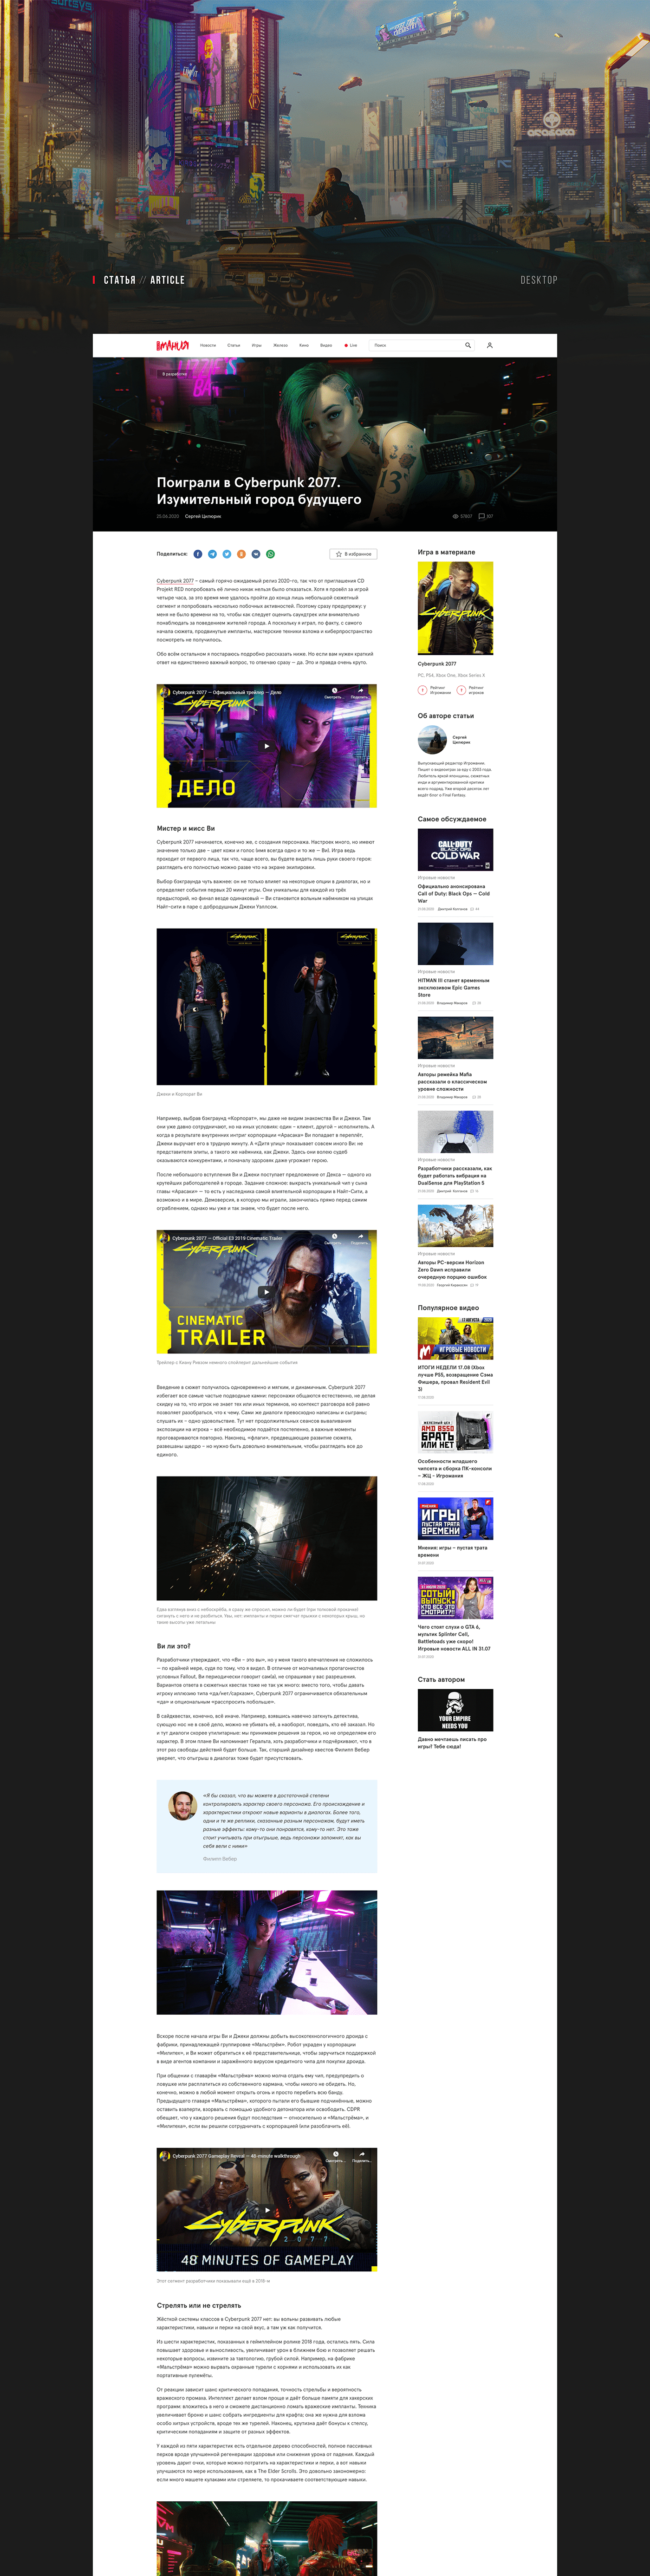 Games Gaming magazine news UI ux Webdesign Website gaming news gaming portal